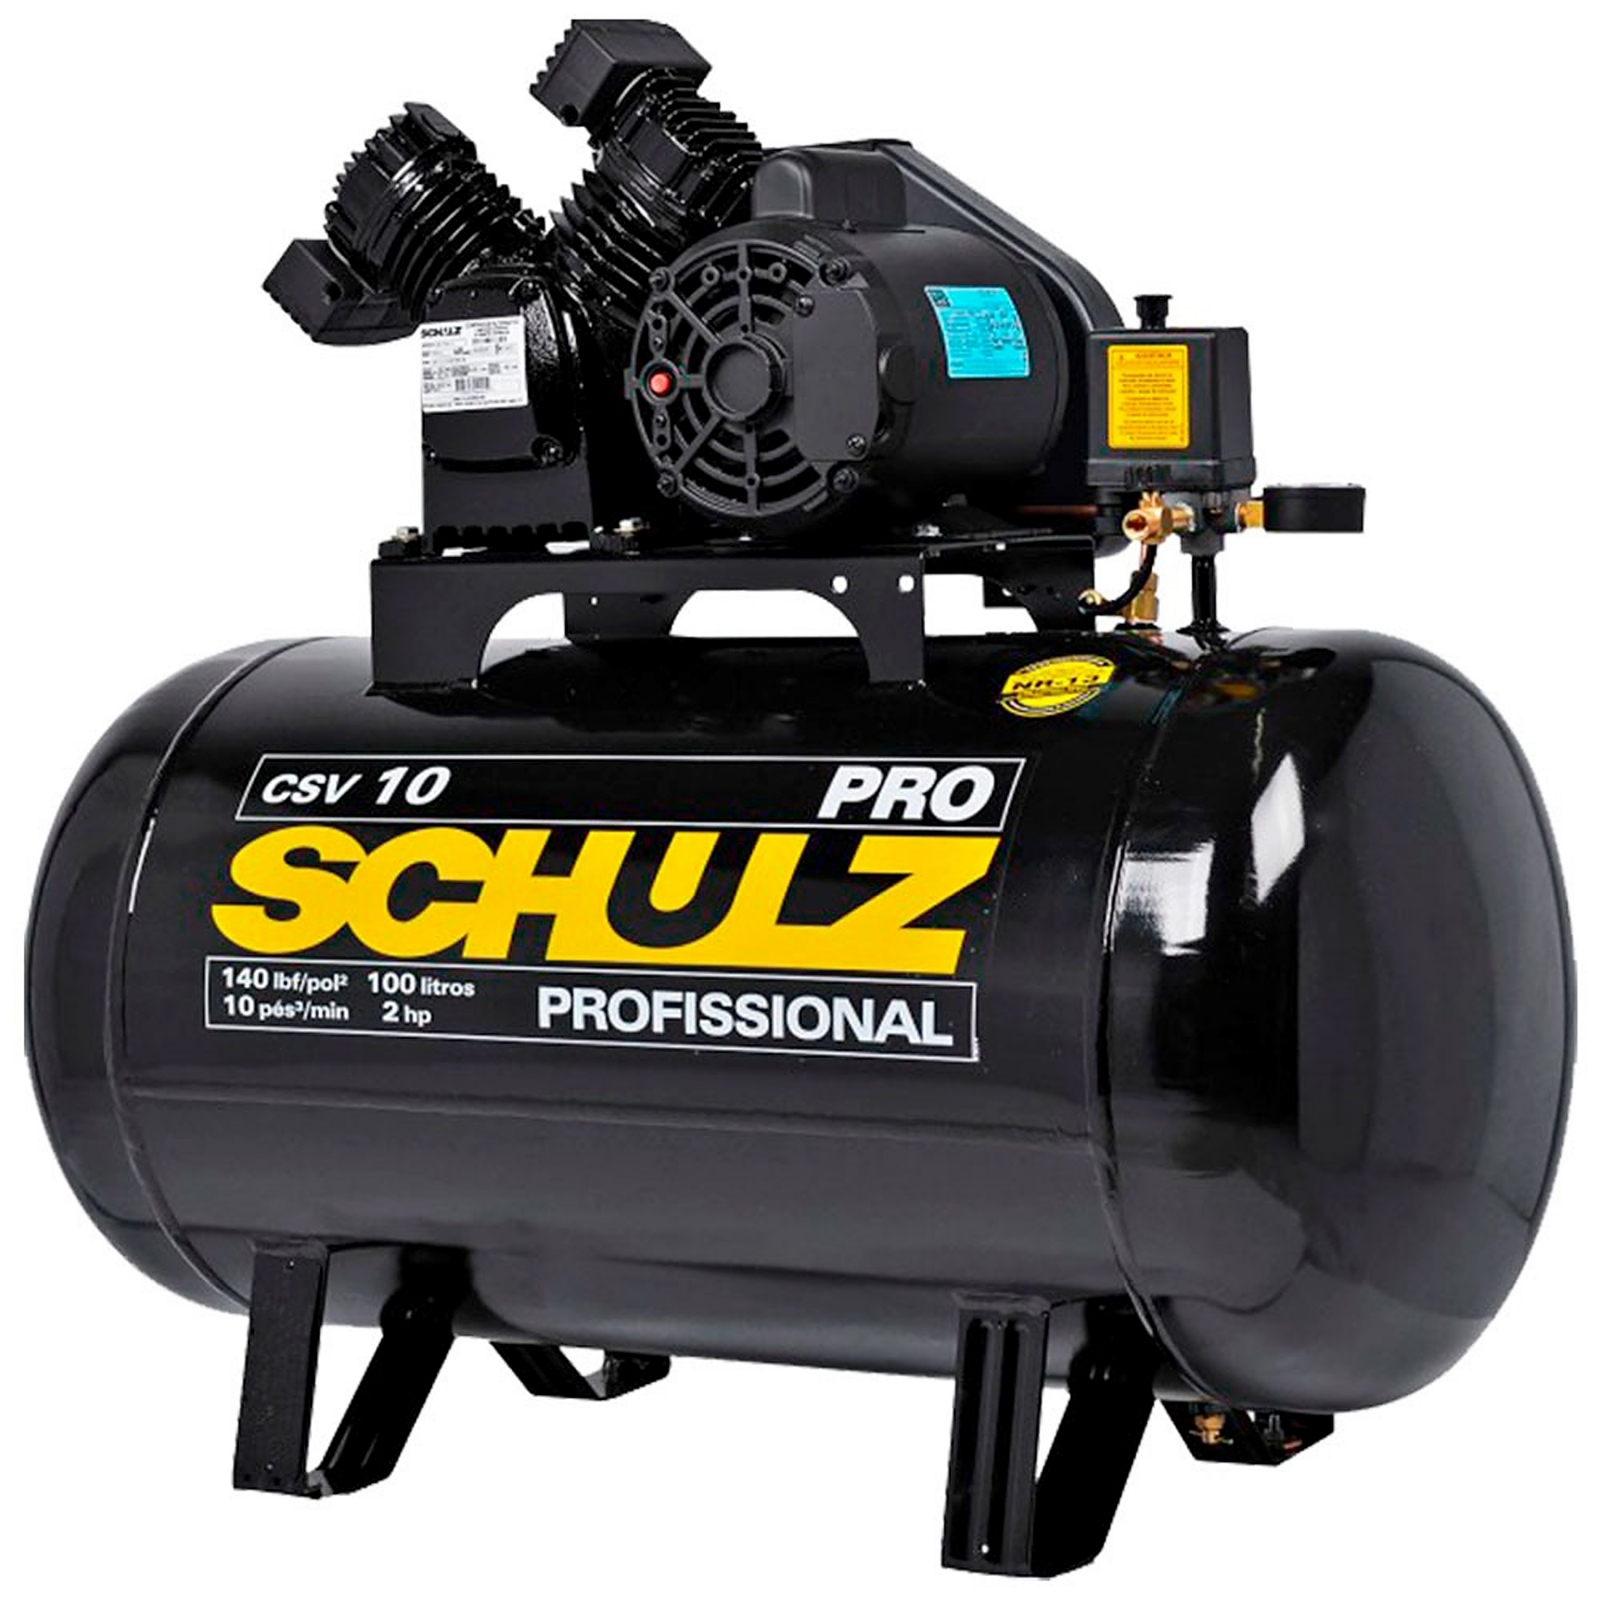 Compressor 10 Pés 2cv CSV-10/100 PRO SCHULZ - Ferramentas MEP